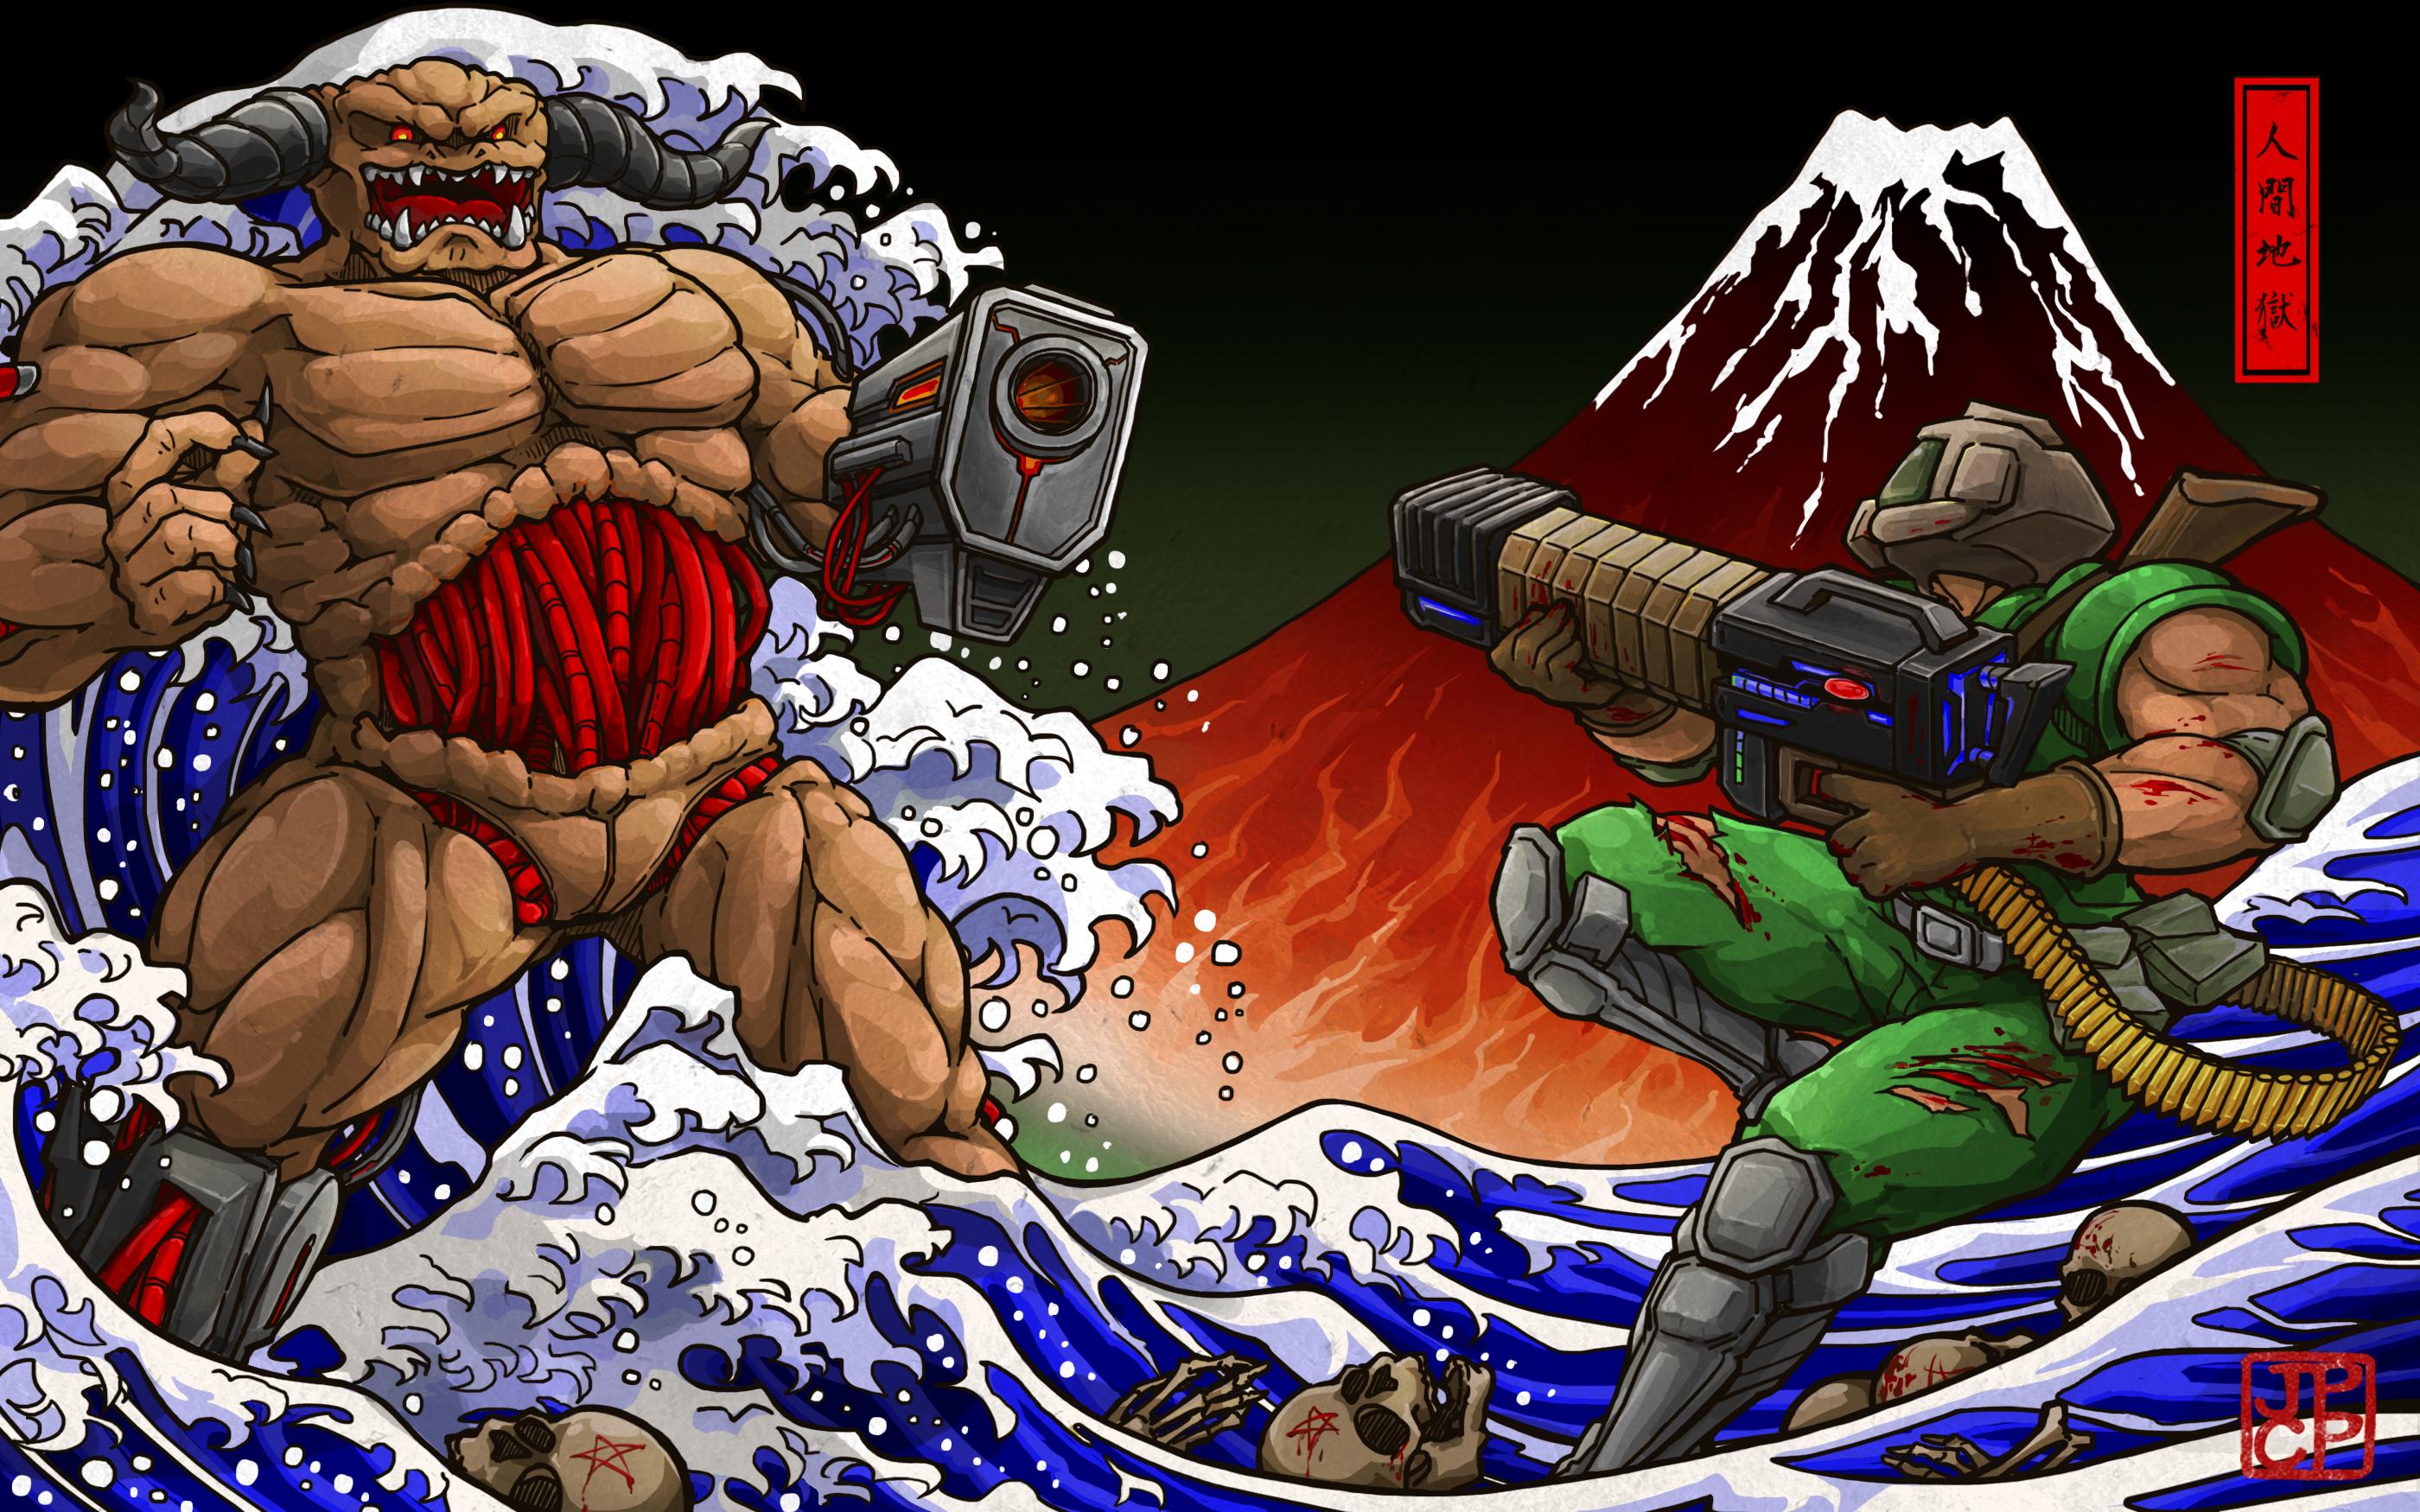 Wallpaper Doom Game Shotgun The Great Wave Off Kanagawa